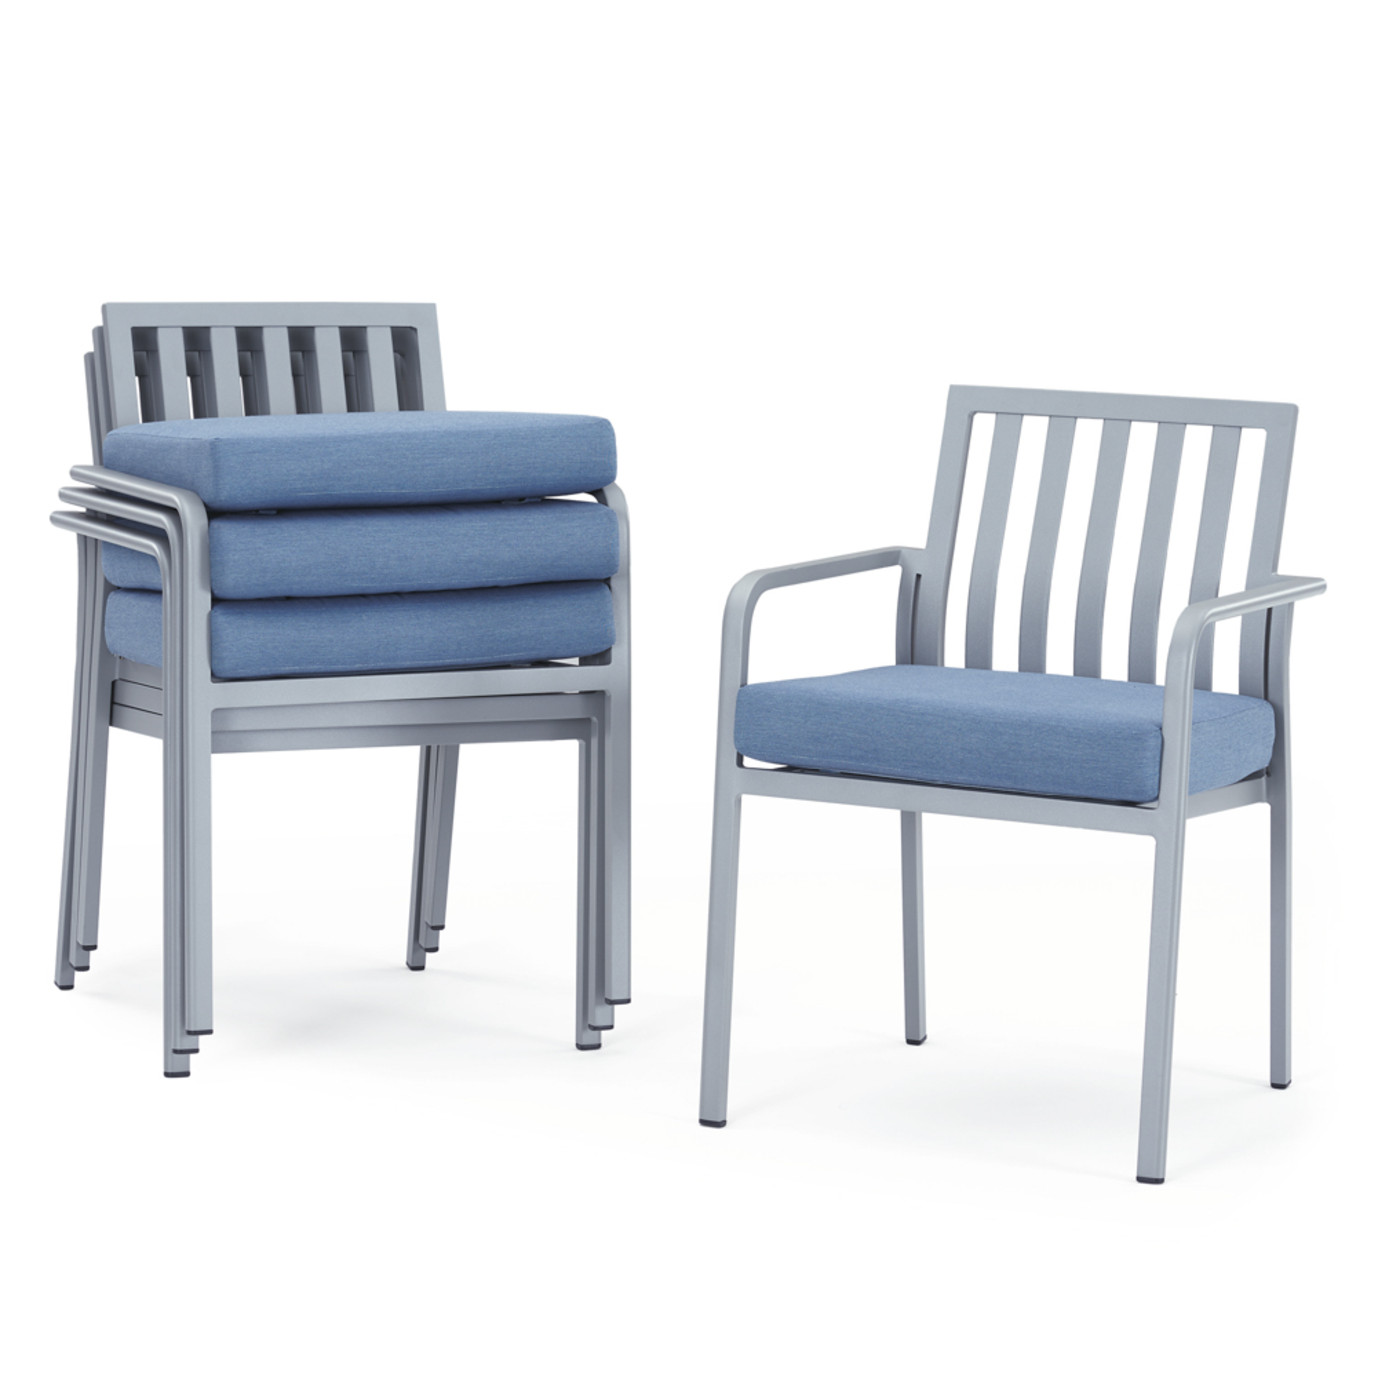 Vera™ 4pc Dining Chairs